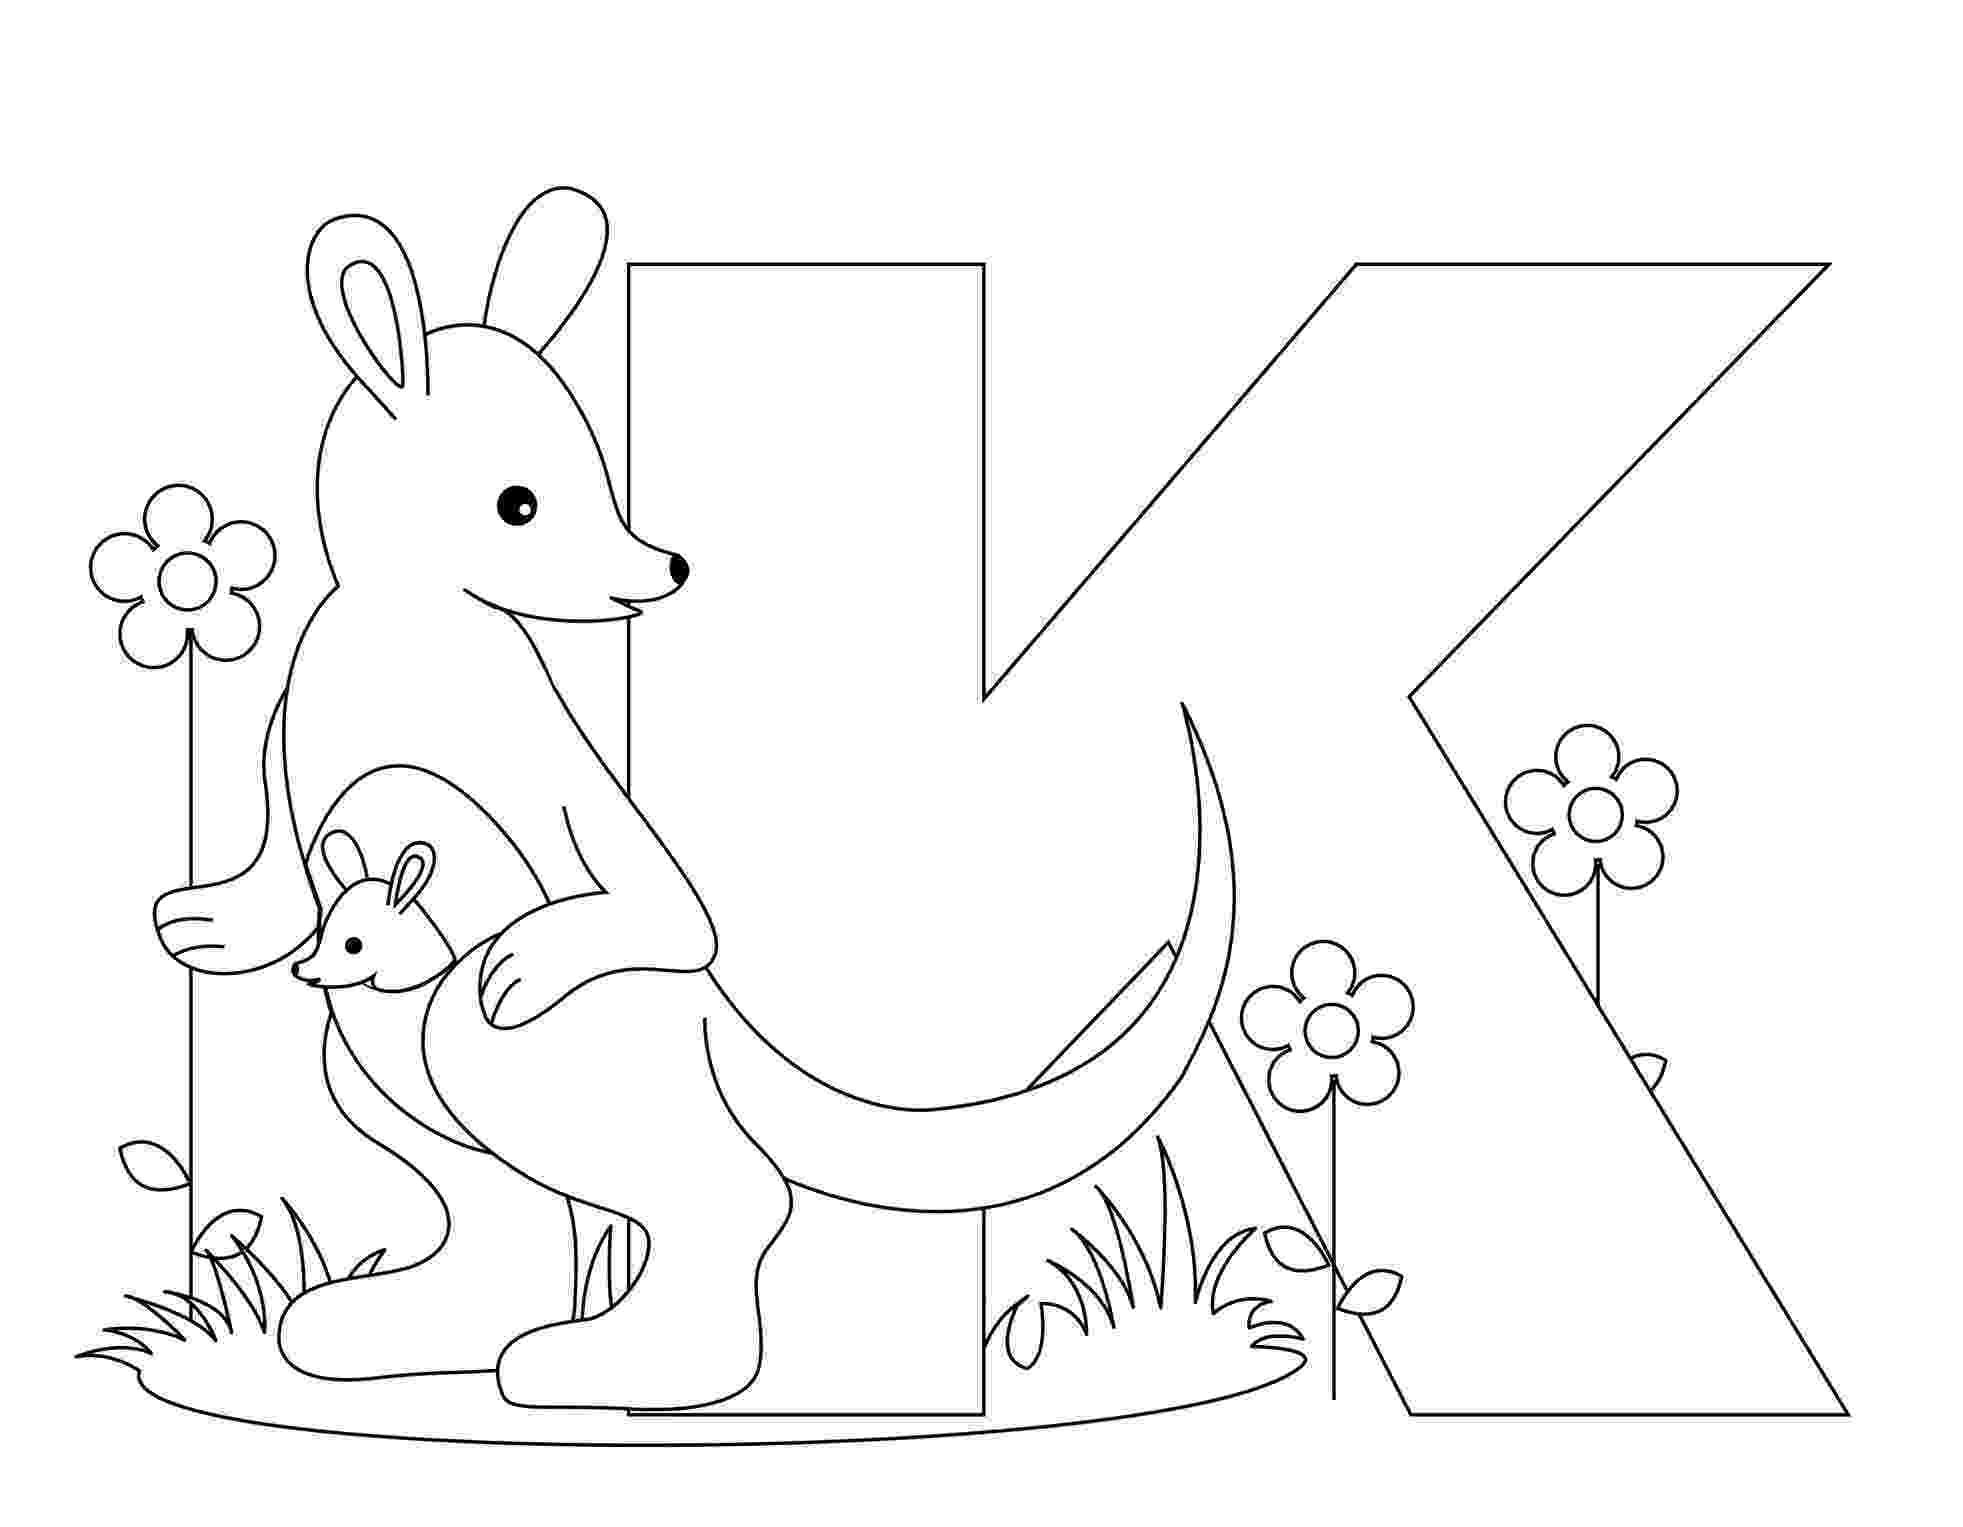 coloring animal alphabet free printable alphabet coloring pages for kids best coloring animal alphabet